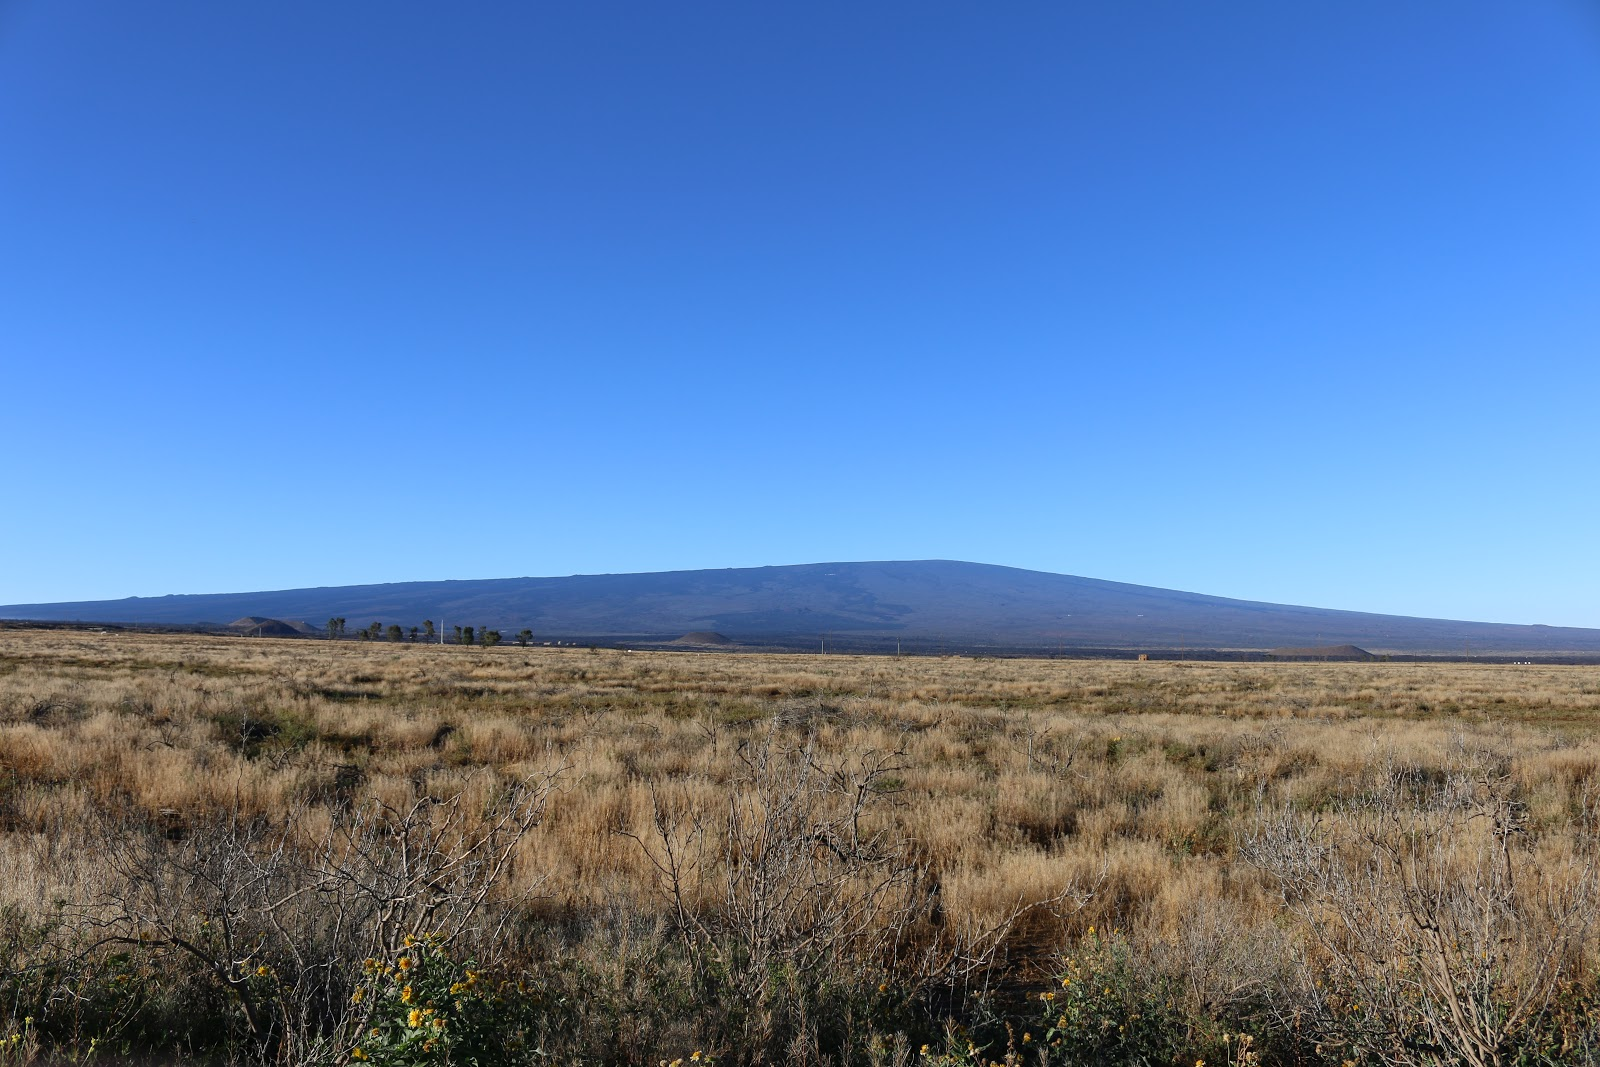 Mauna Loa - longest bike climb in the world